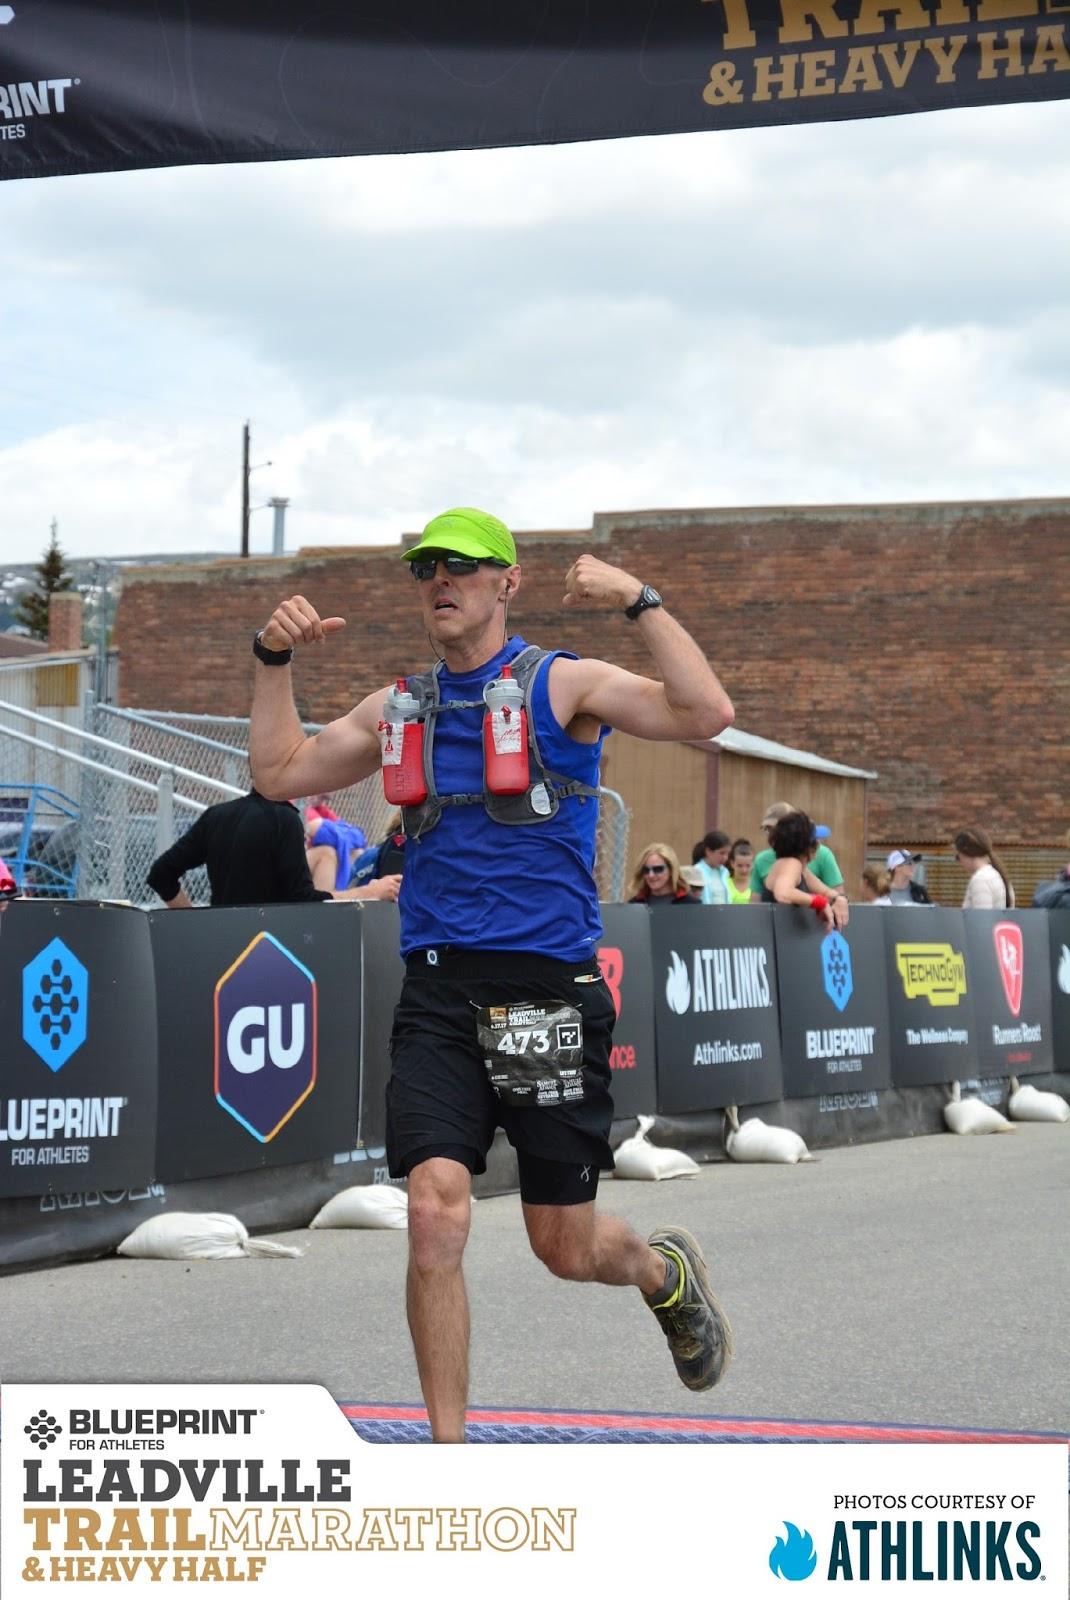 The running man 2017 finishing the leadville trail marathon on saturday malvernweather Images